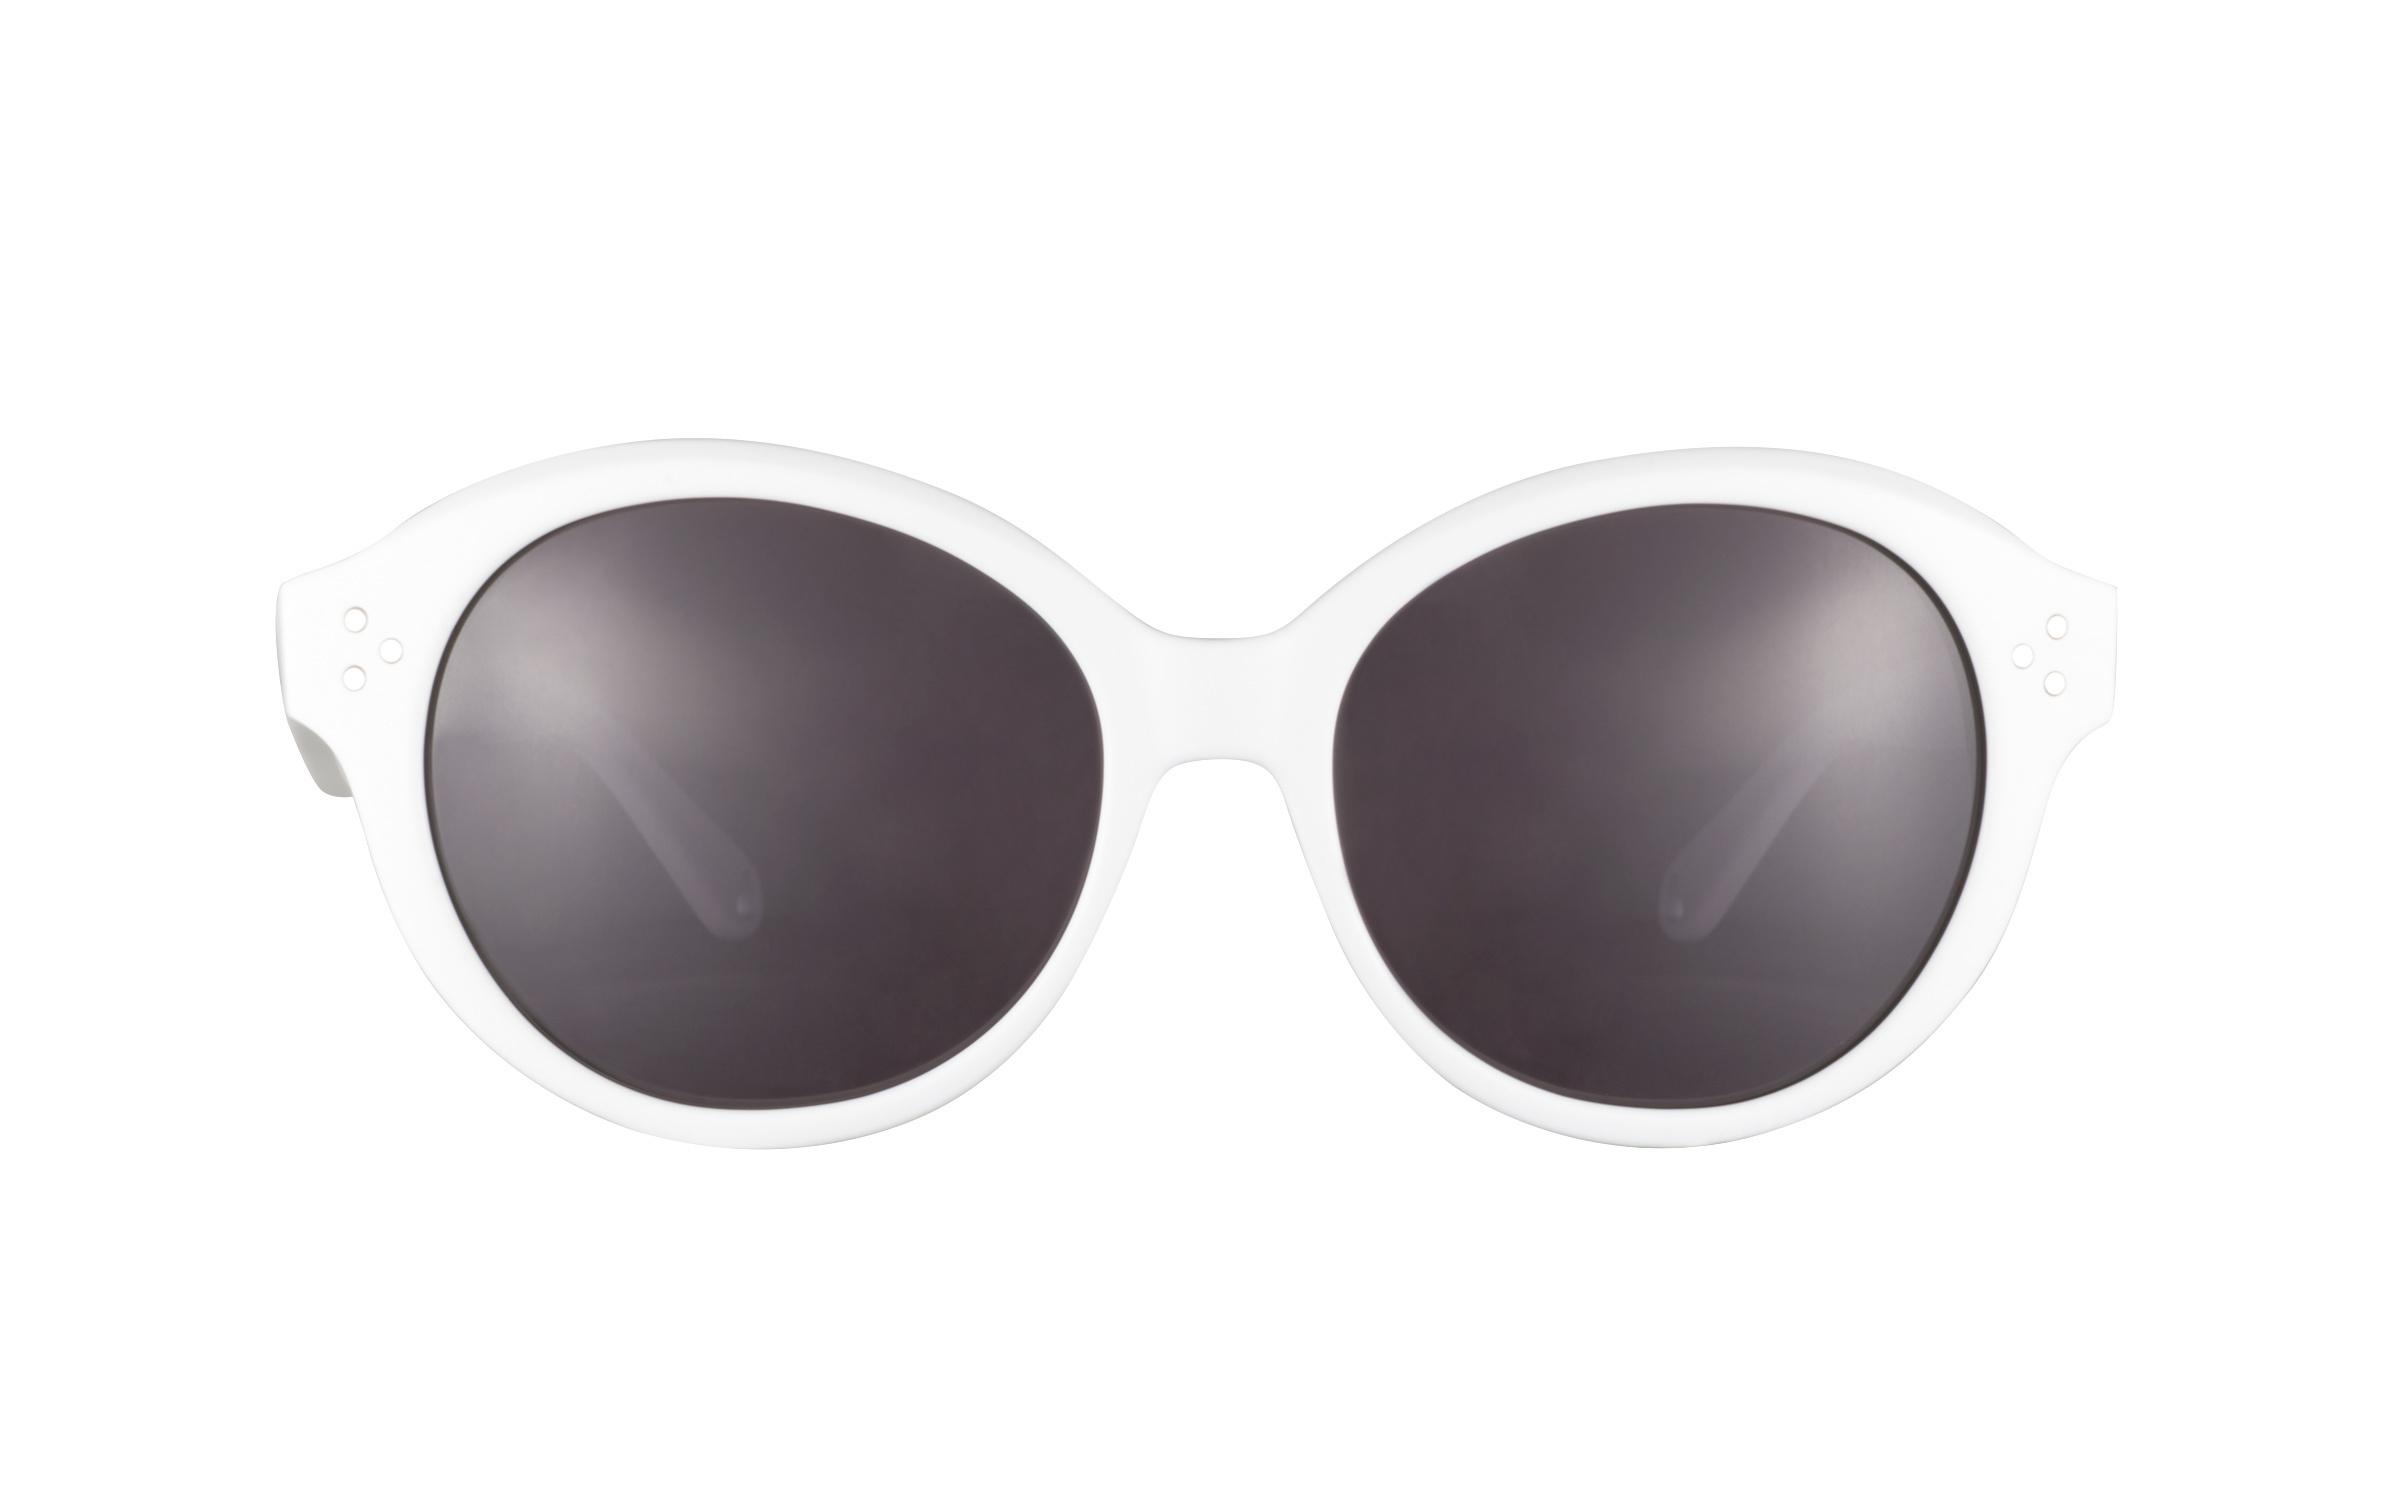 Retro_Sunglasses_White_Love_Online_Coastal